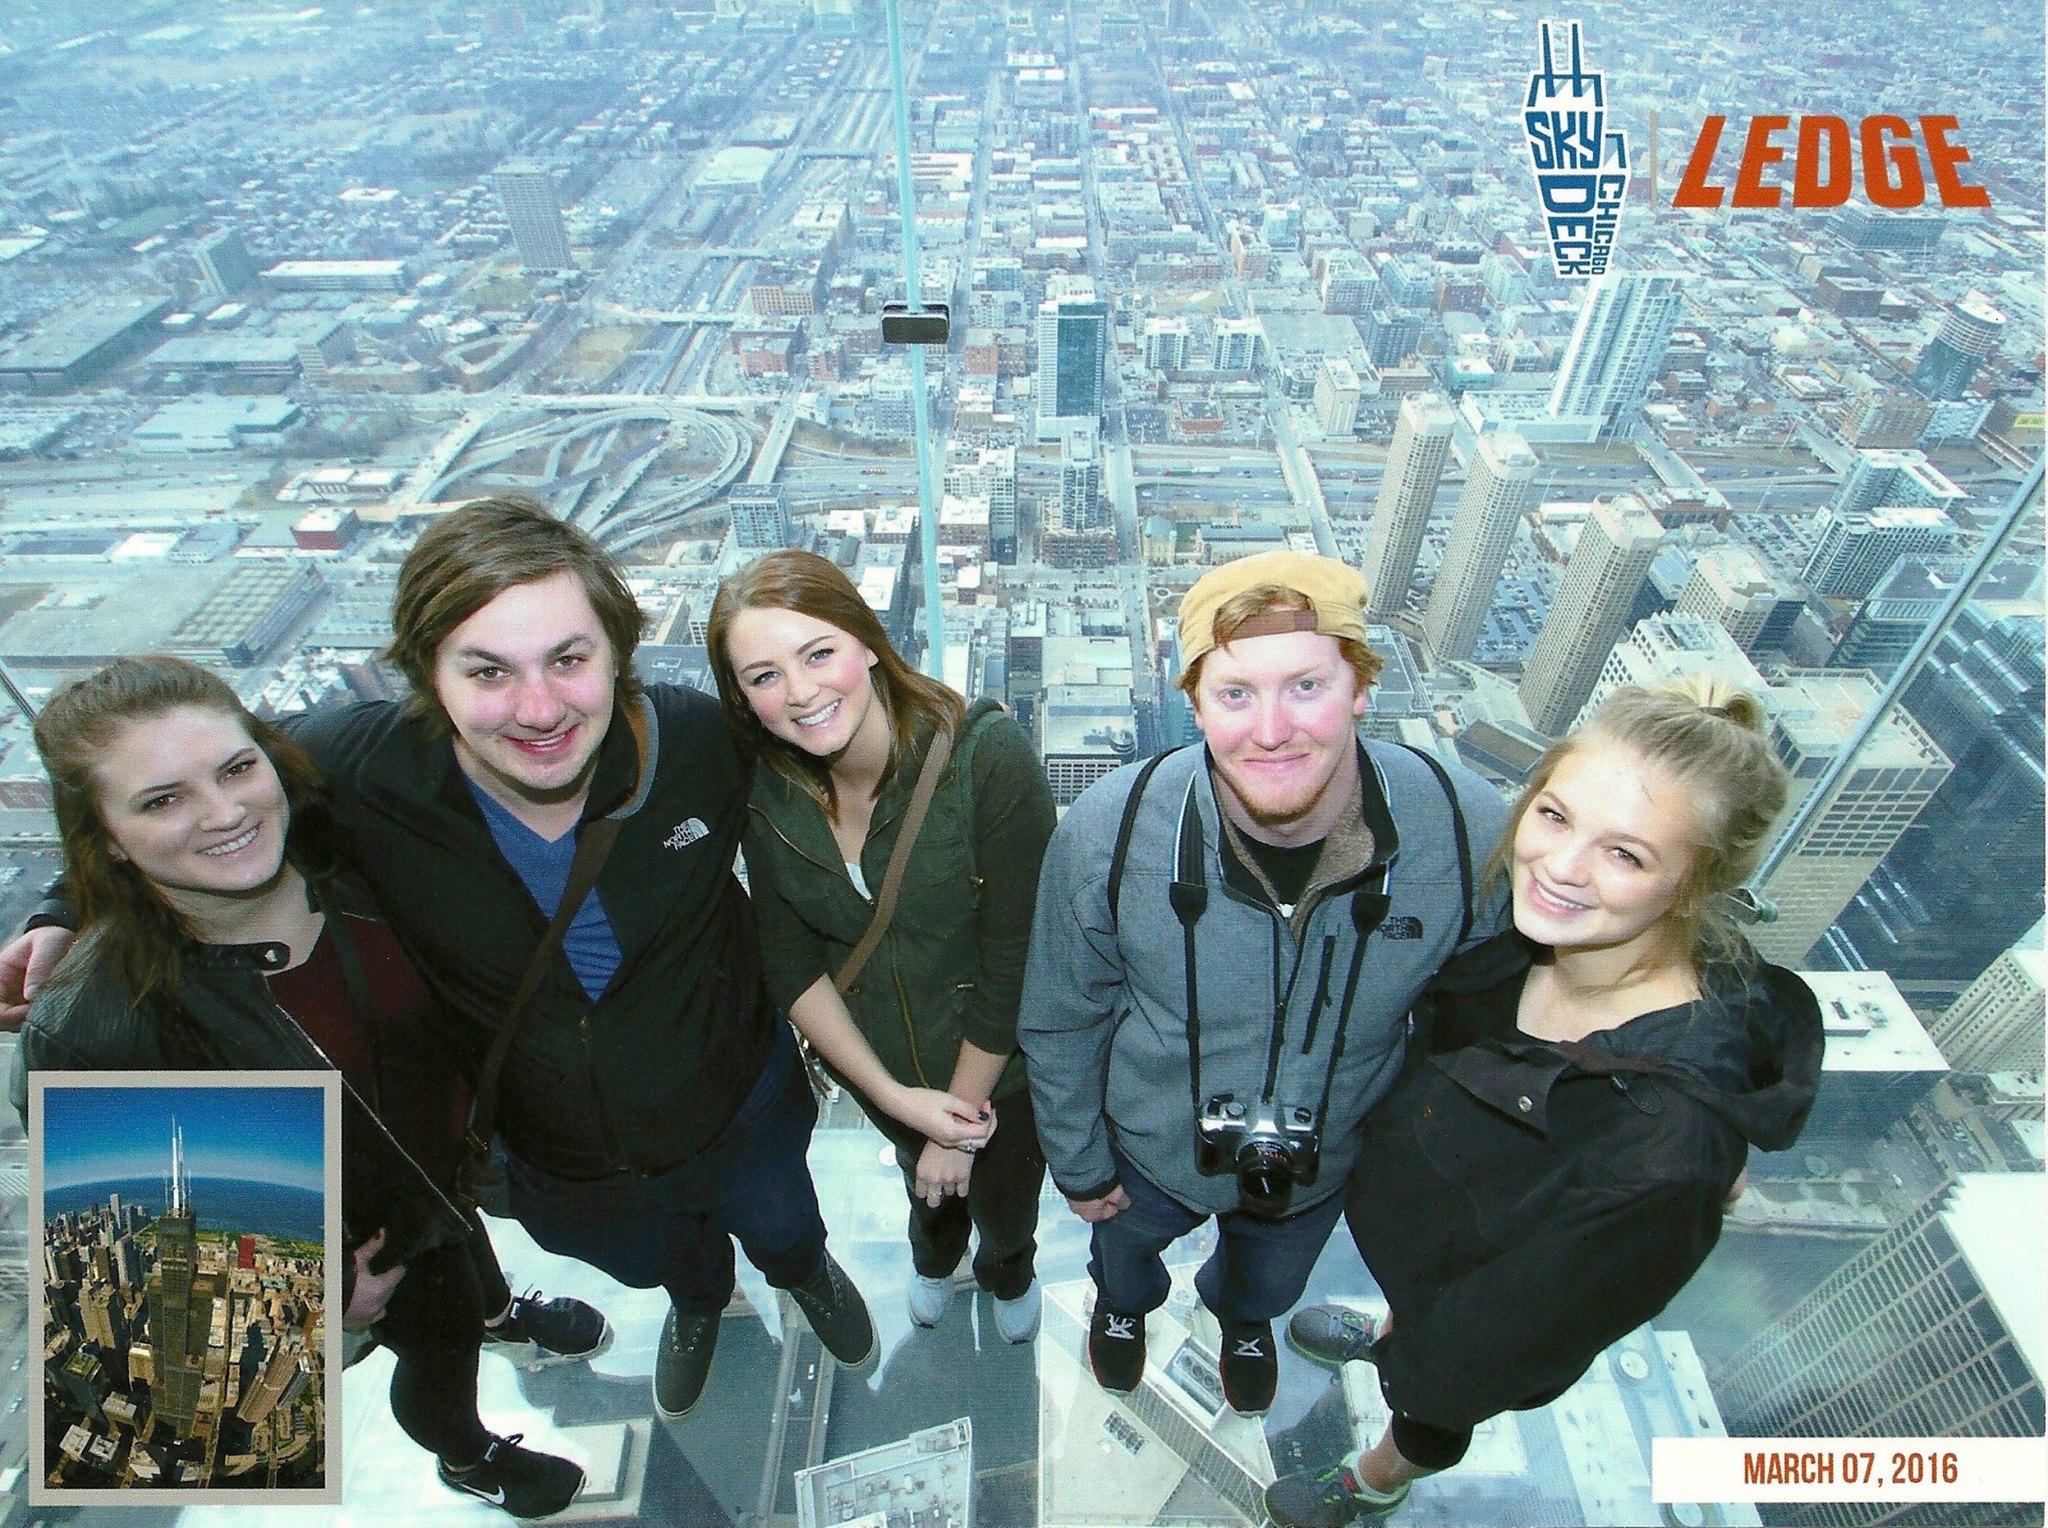 Willis Tower SkyDeck, Chicago, IL